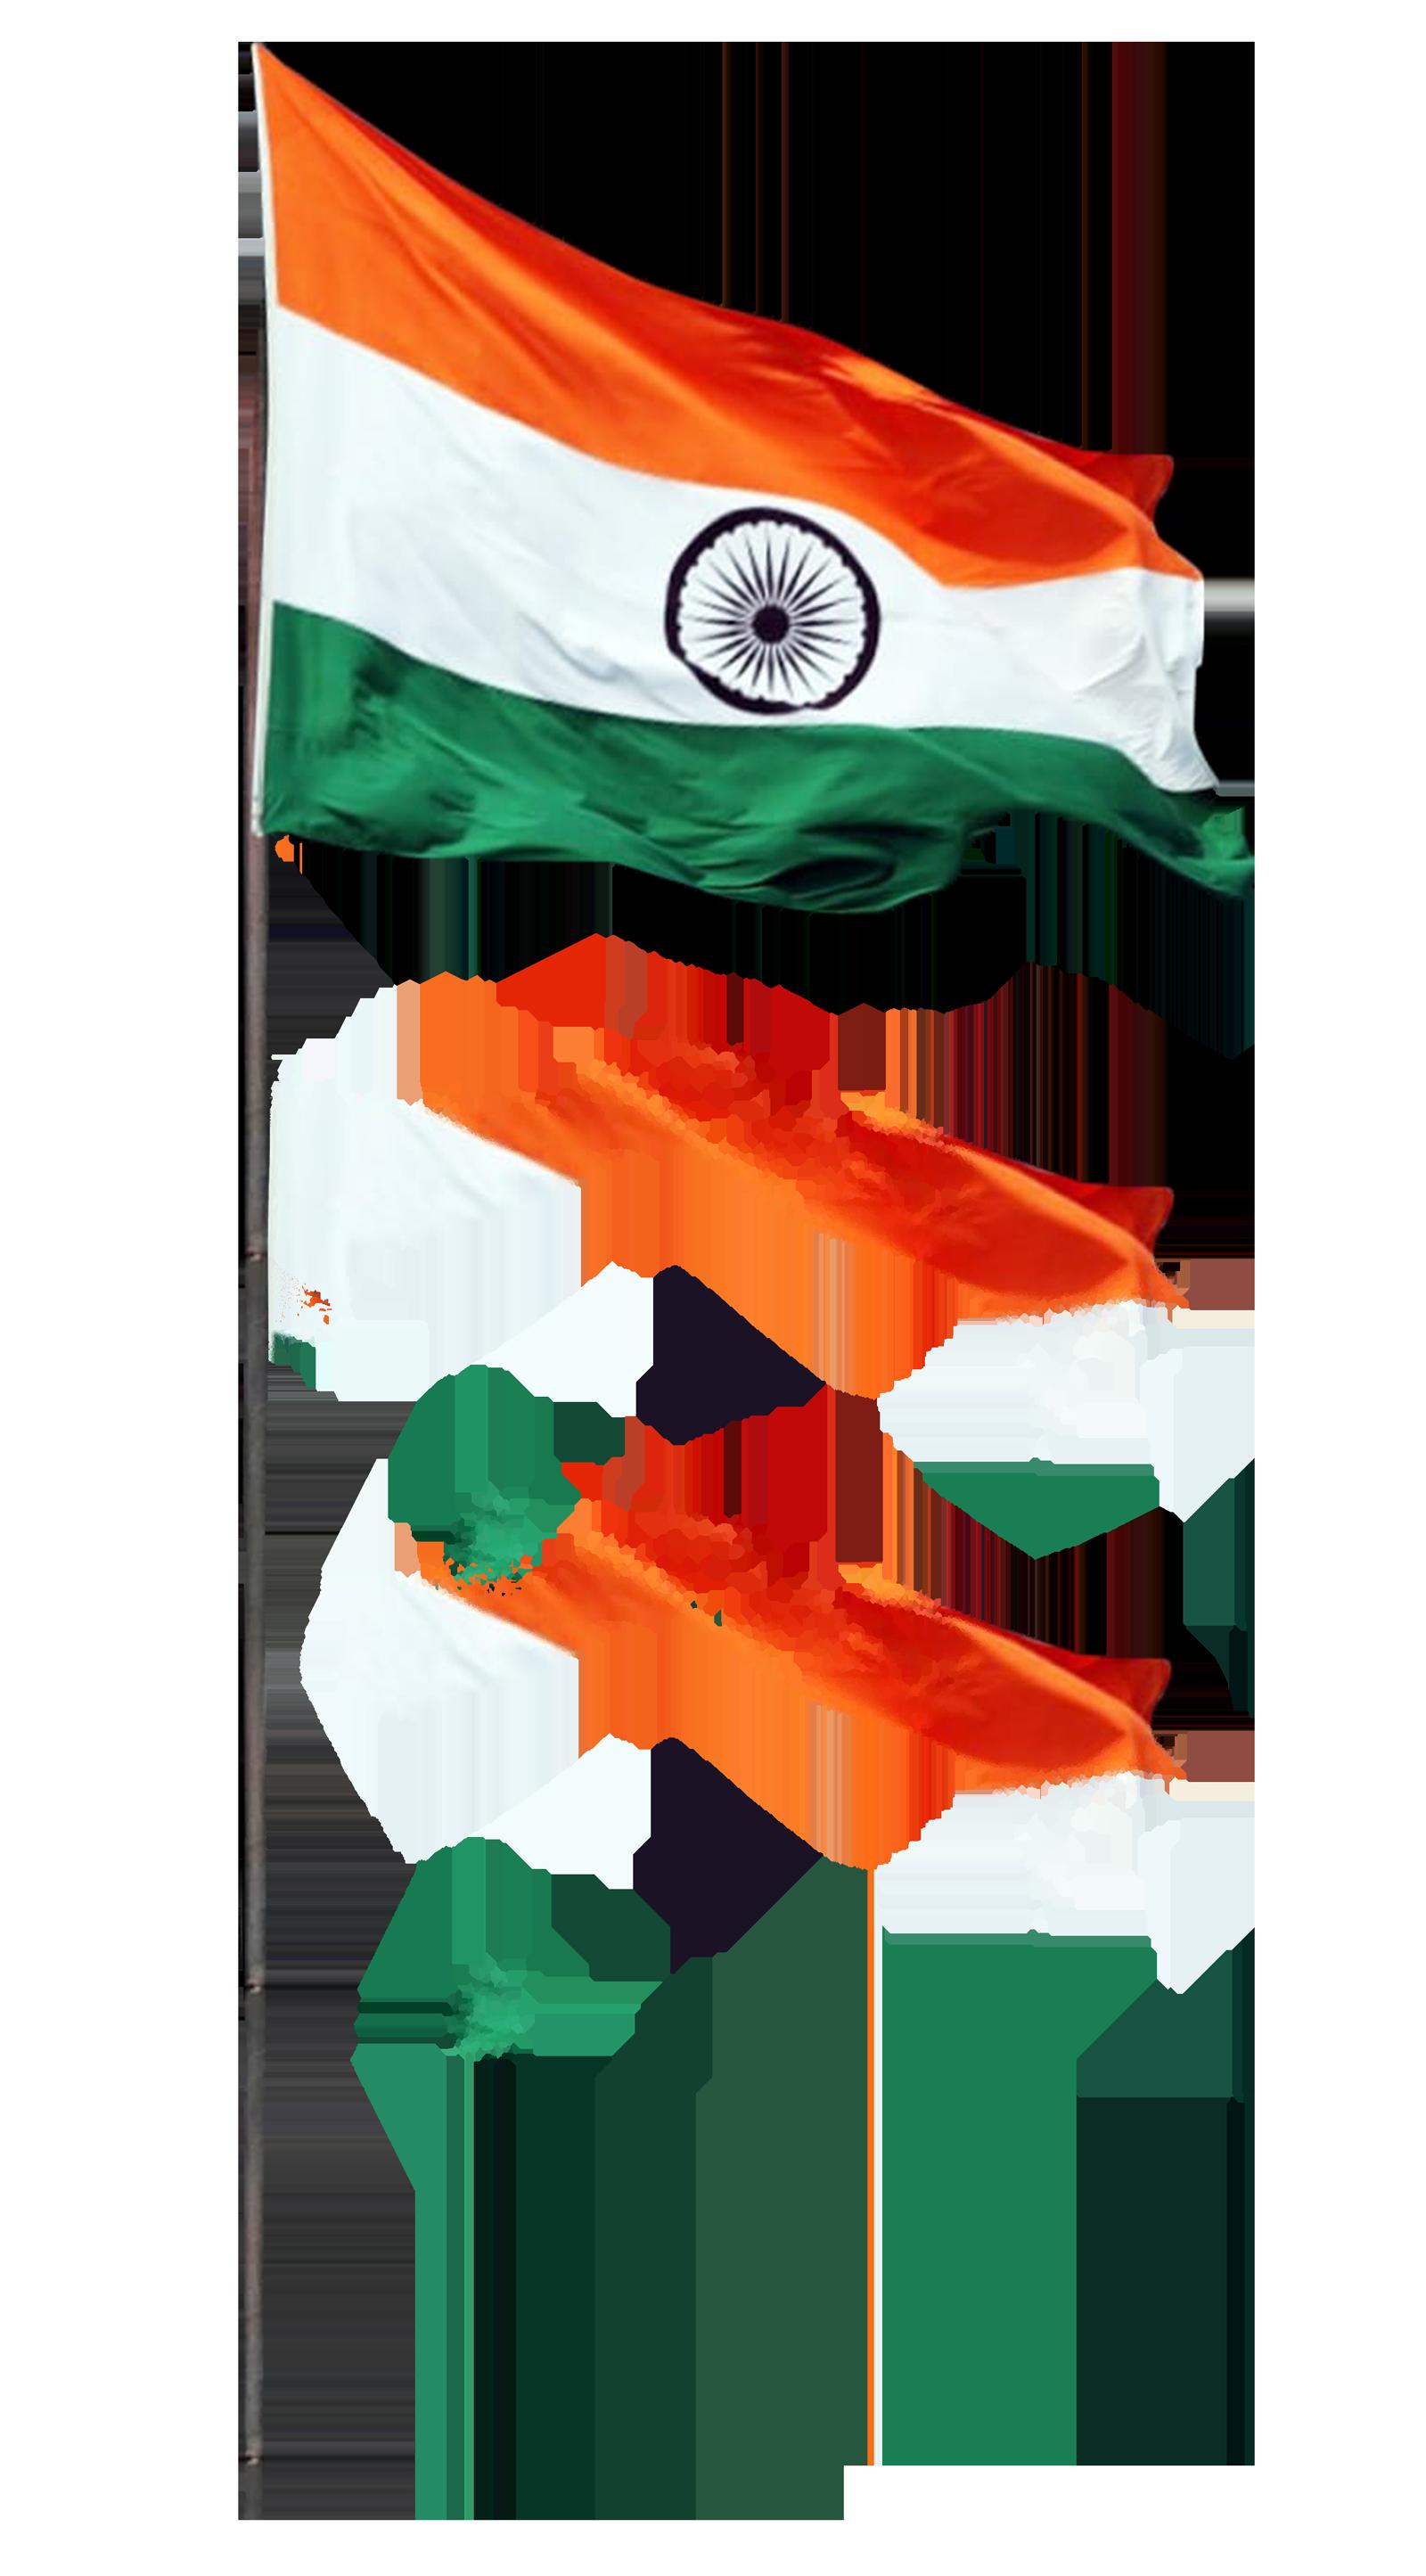 indian flag png image